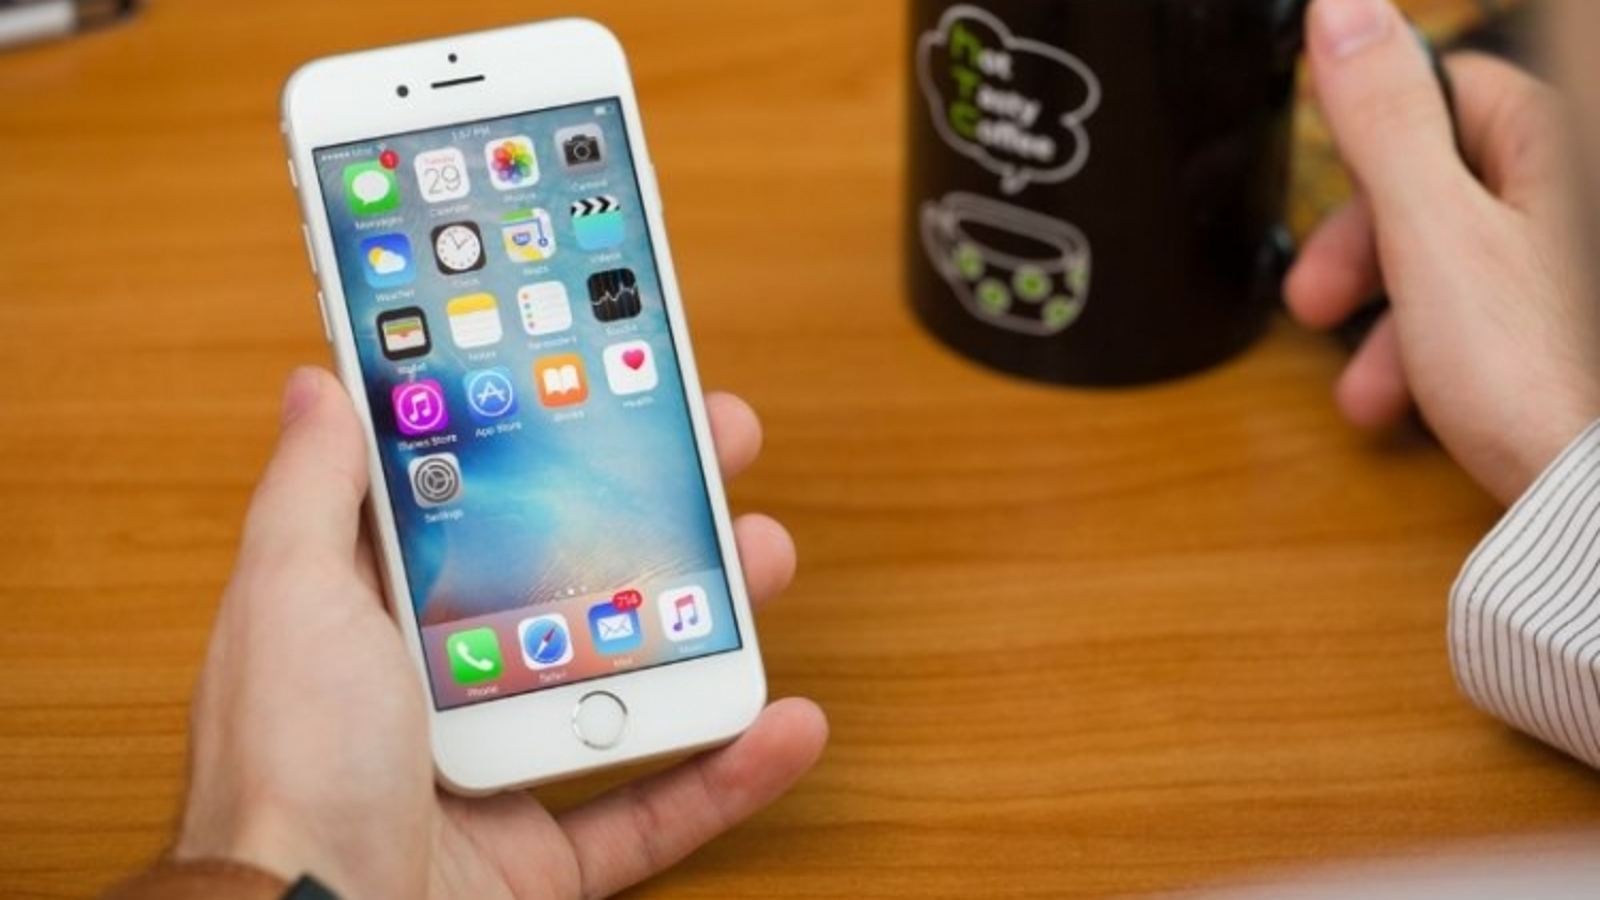 Ba mẫu iPhone phổ biến sẽ bị iOS 15 bỏ rơi